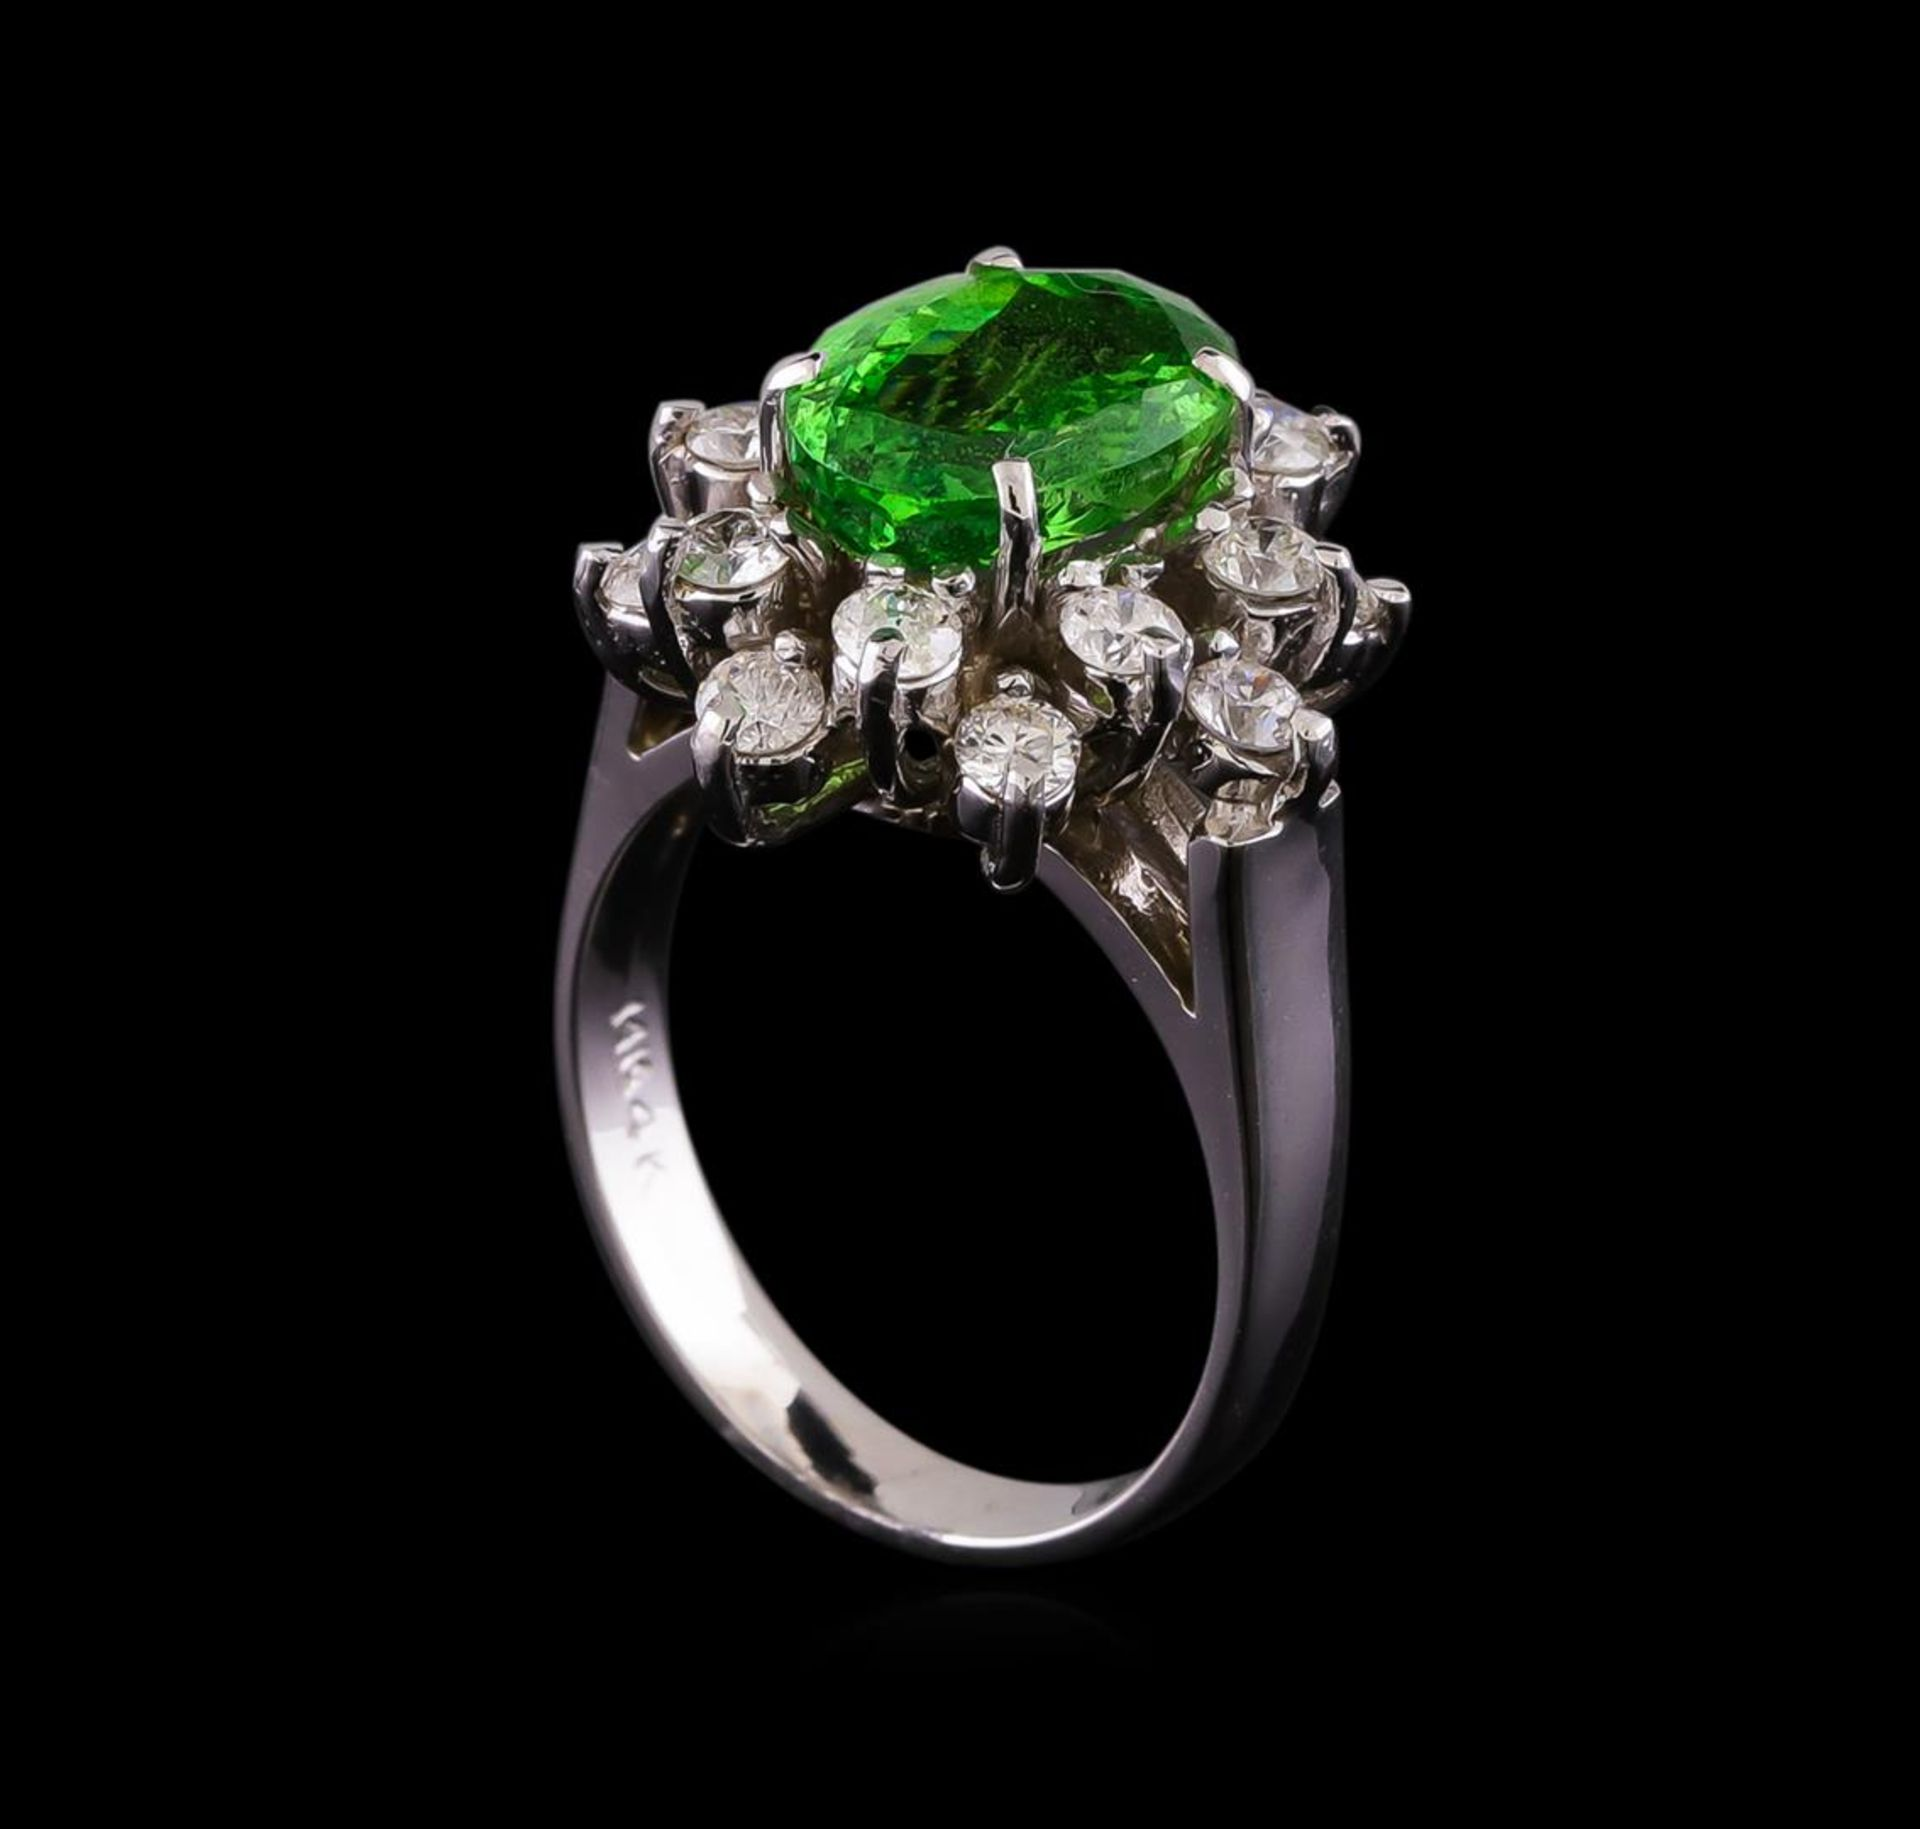 2.51 ctw Tsavorite and Diamond Ring - 14KT White Gold - Image 4 of 5